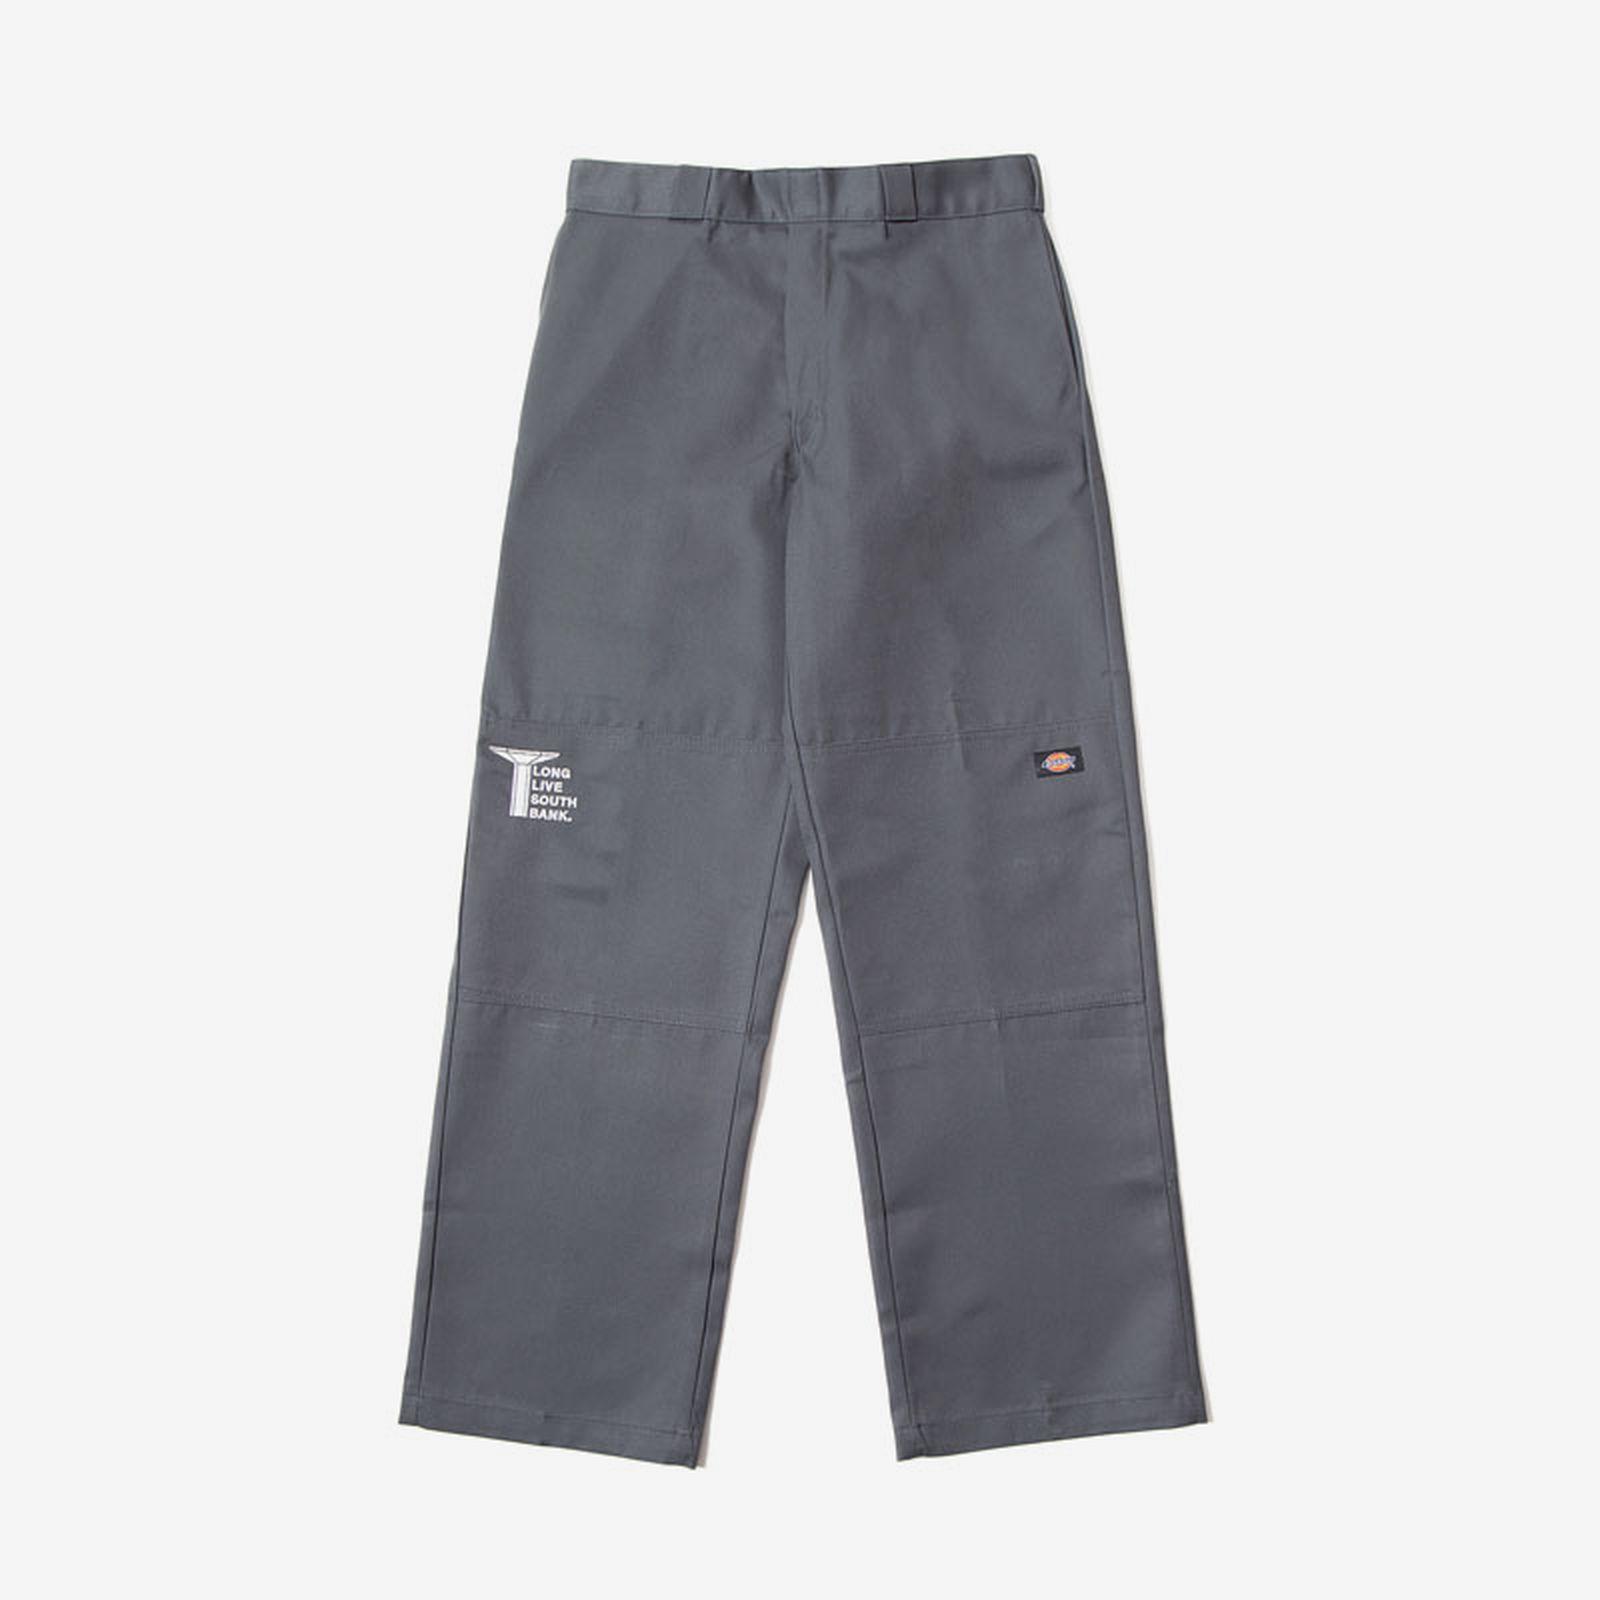 1dickies long live southbank double knee workspants edited